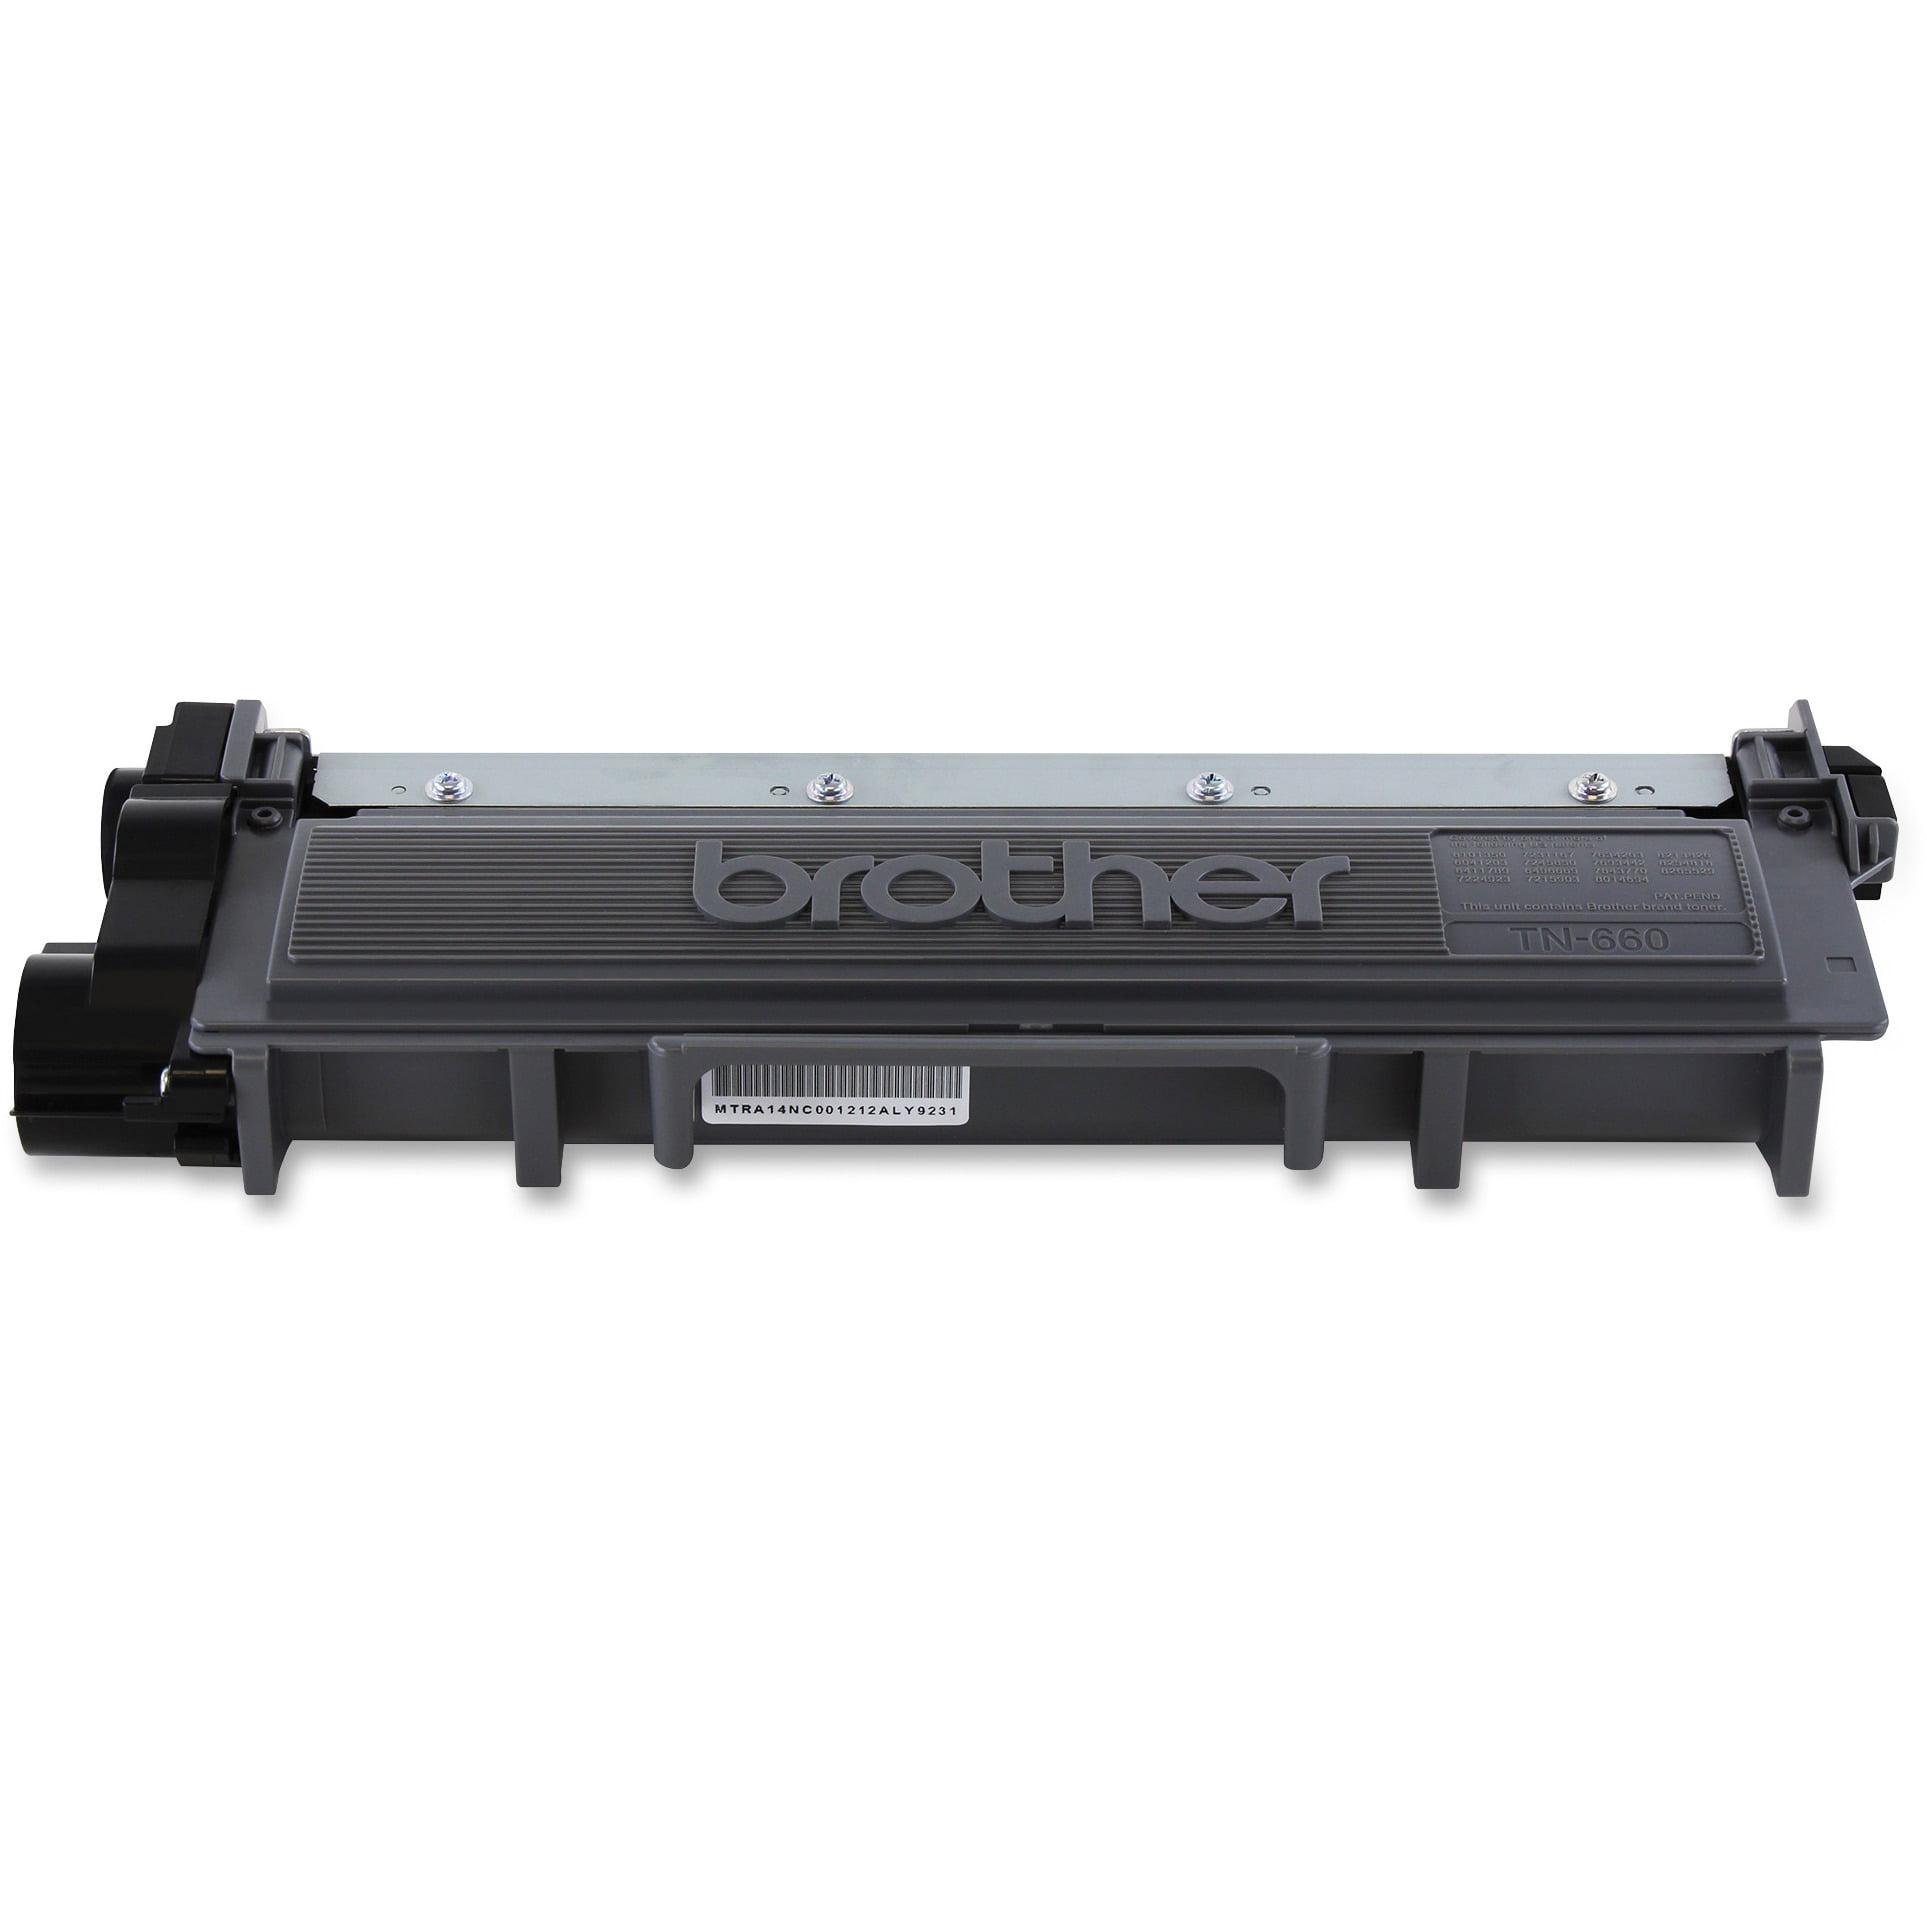 Brother Genuine TN660 High-Yield Toner Cartridge, Black